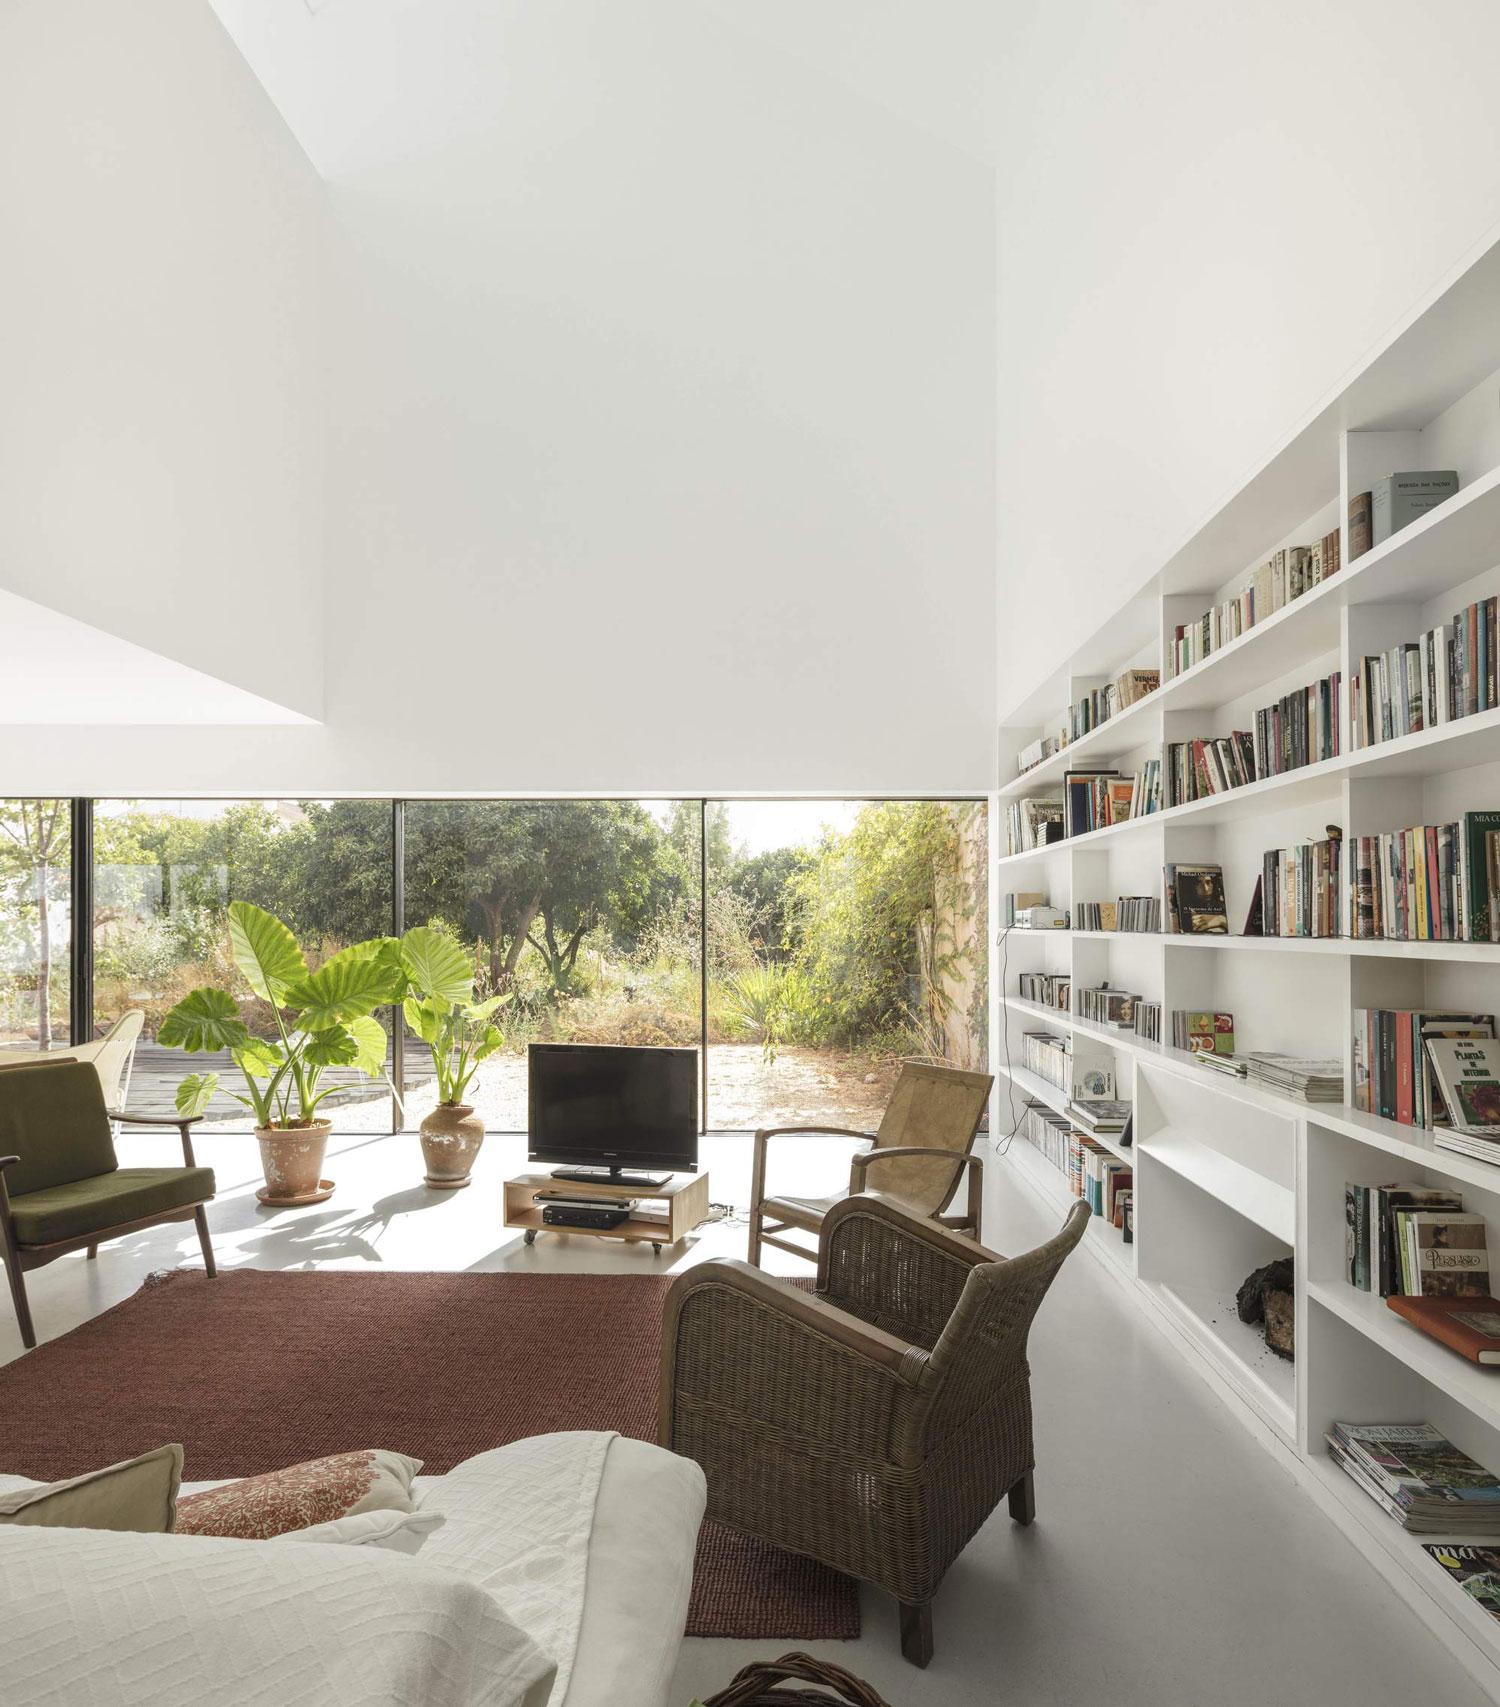 konyhasziget_minimal_haz_portugaliabol_red-house-in-setubal-portugal-by-extrastudio_9.jpg